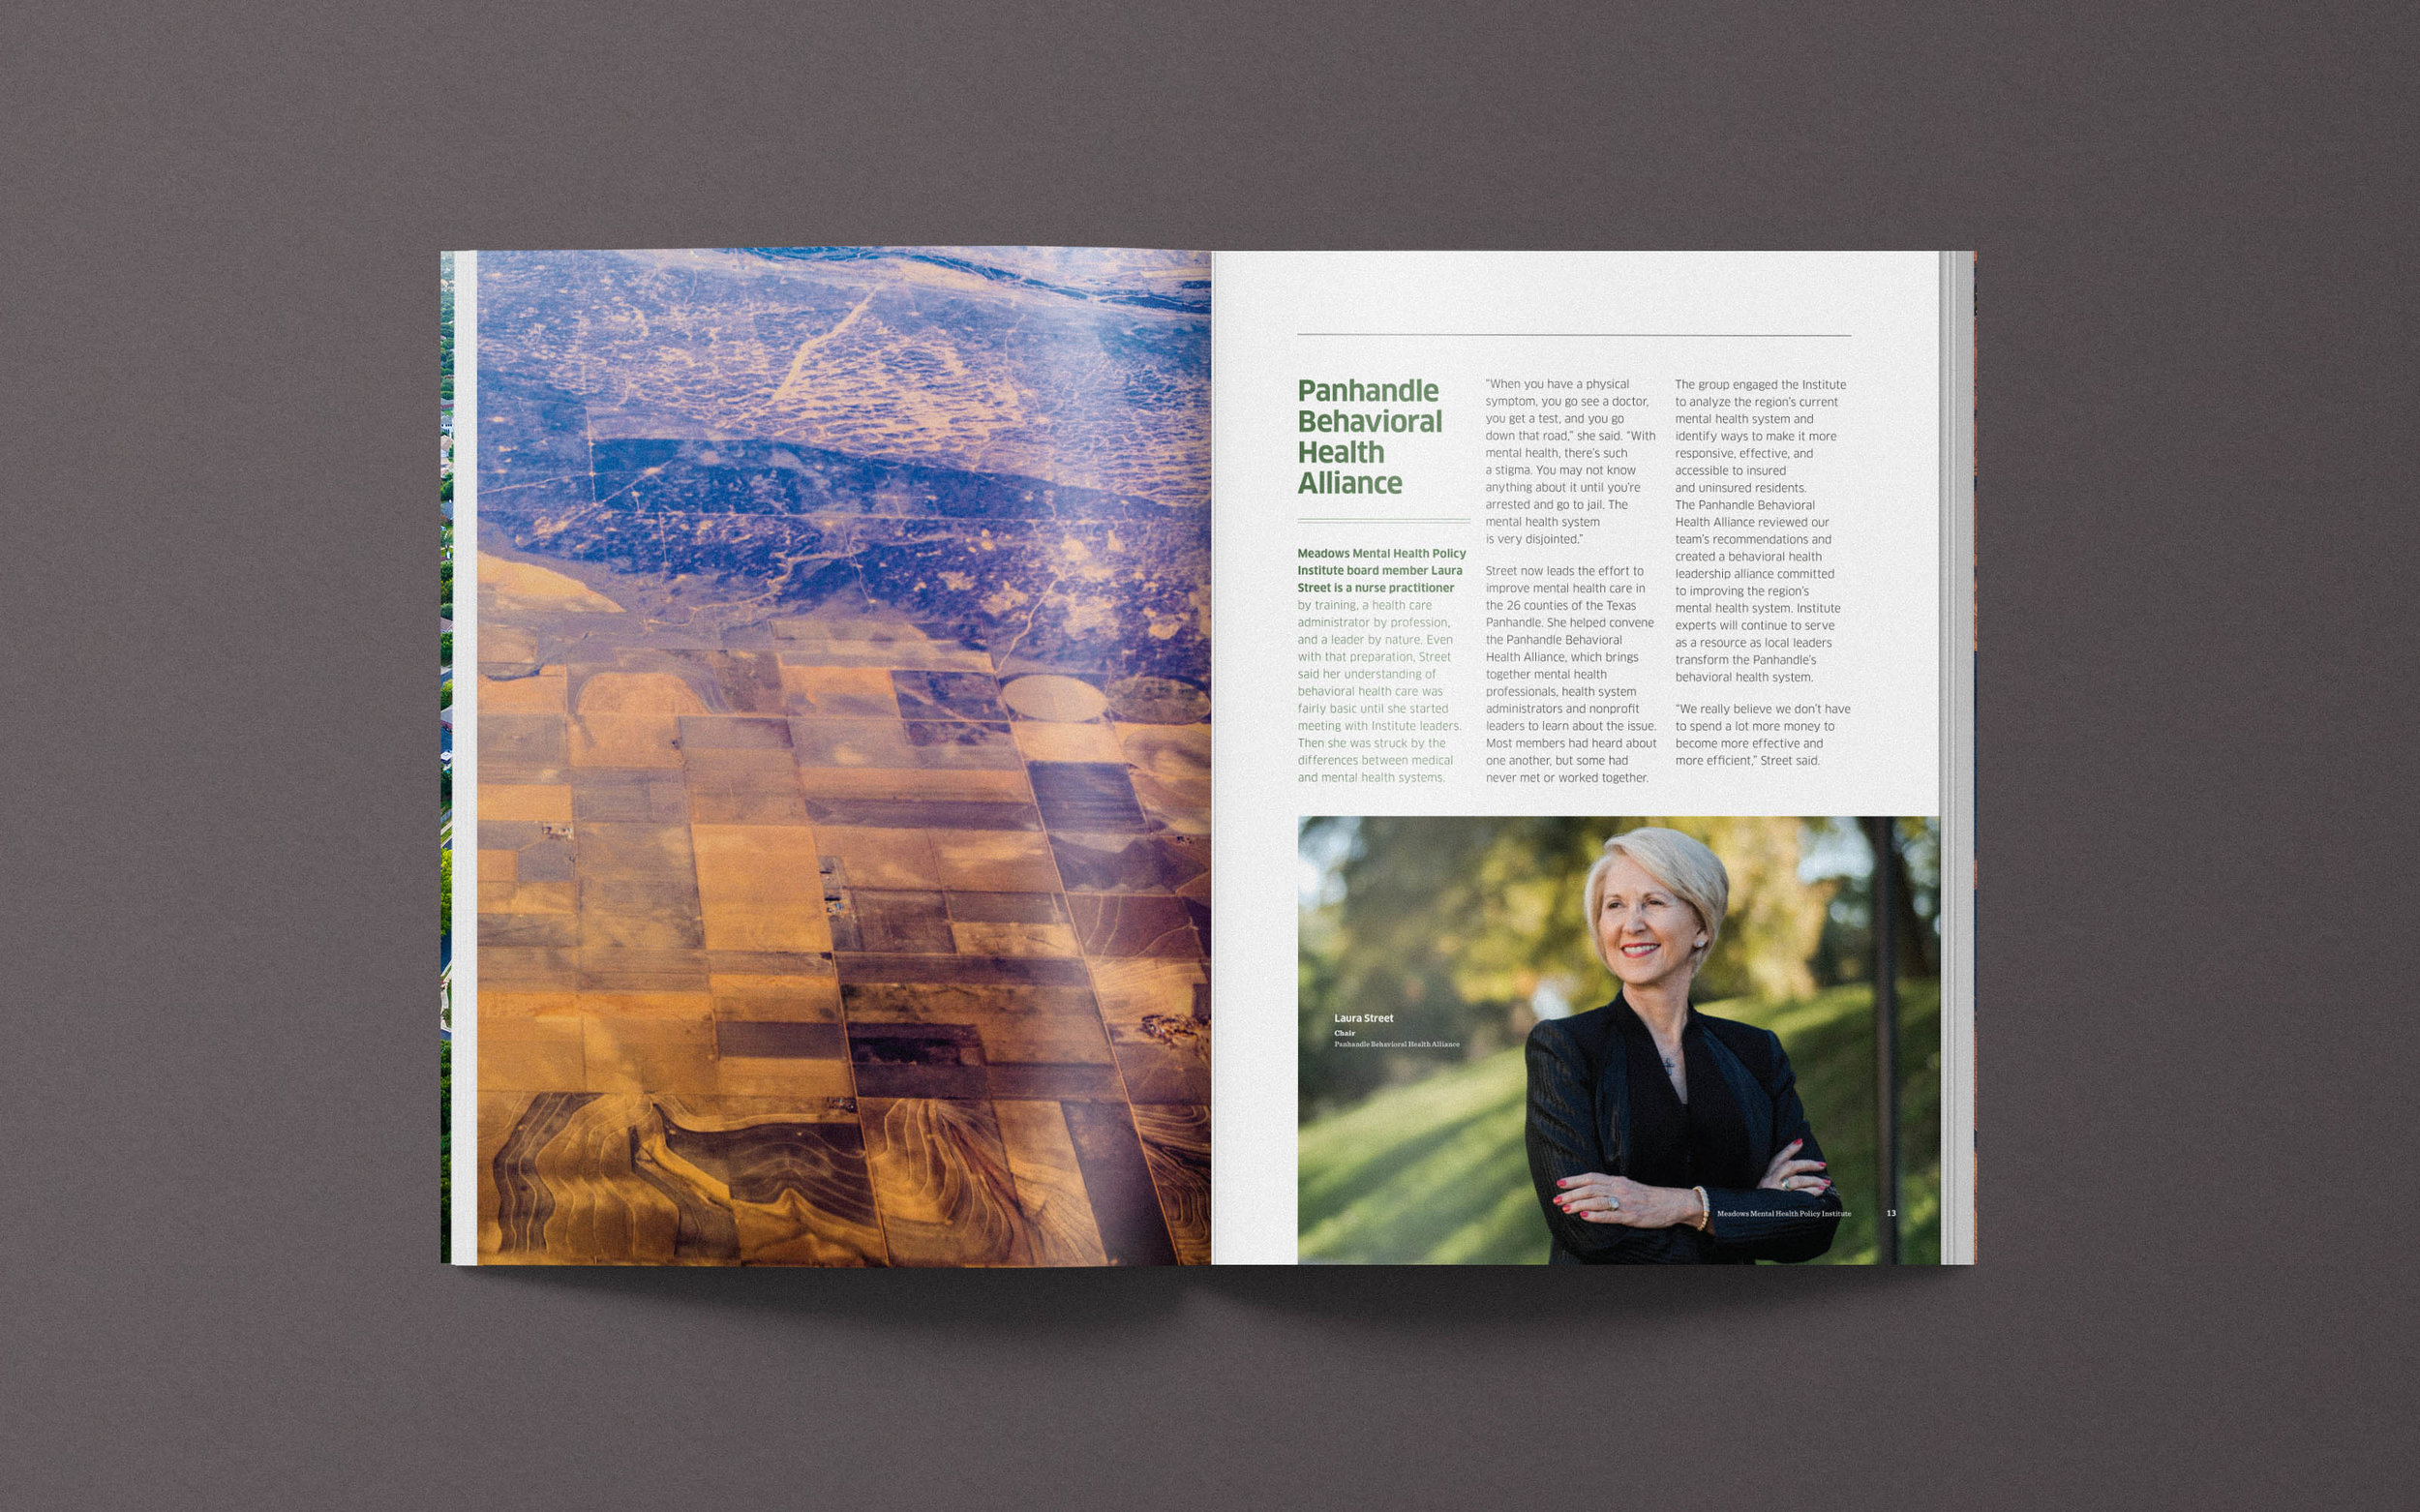 ronaldvillegas-texasstateofmind-annual-report-16-spread-2.jpg